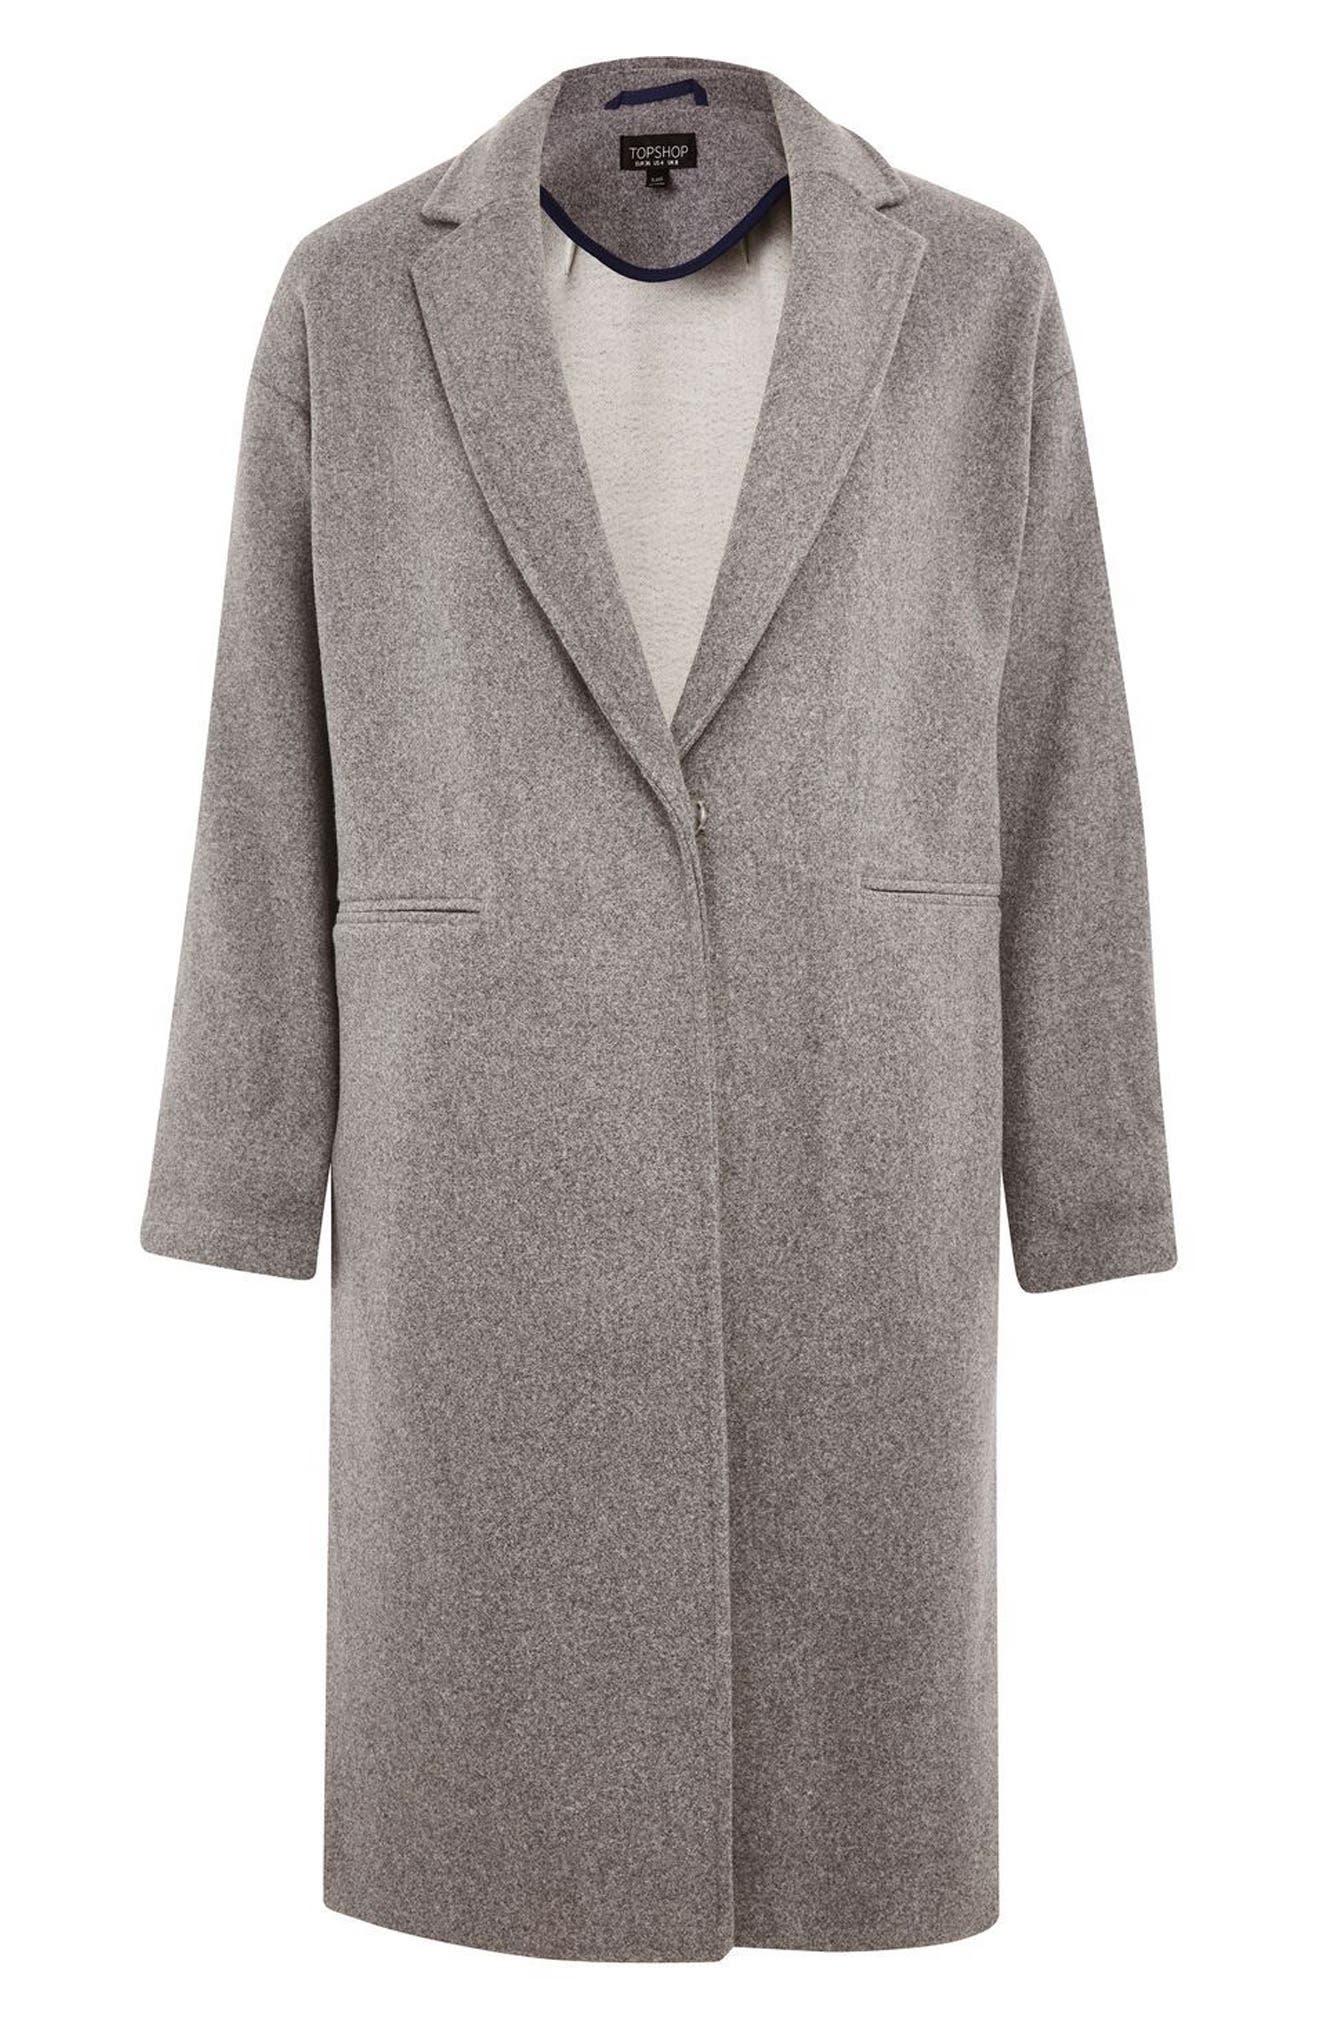 Bonded Knit Coat,                             Alternate thumbnail 4, color,                             Grey